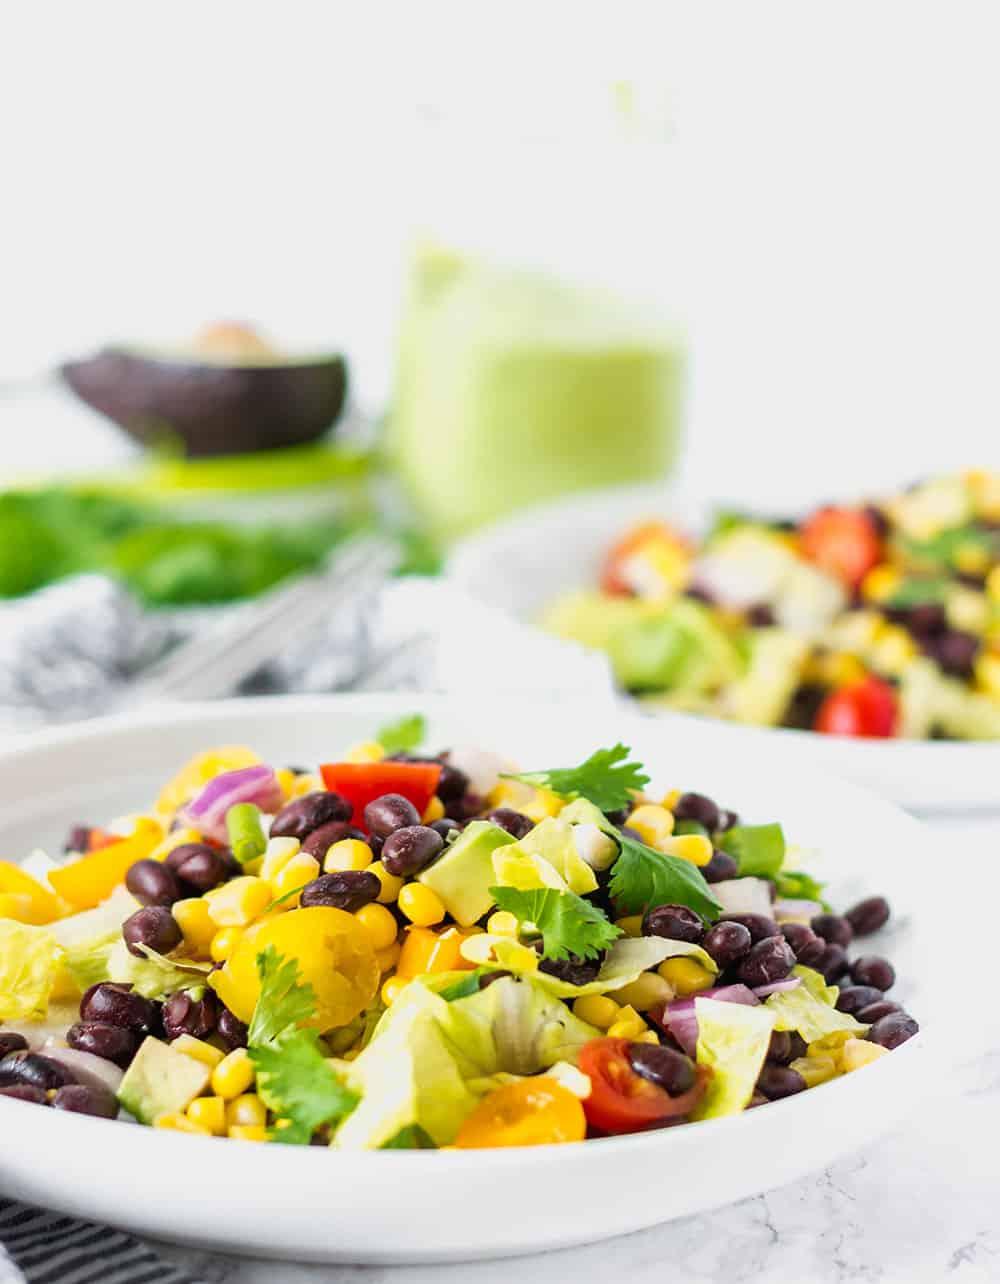 Southwestern Salad with Avocado Dressing, Vegan., Gluten-Free